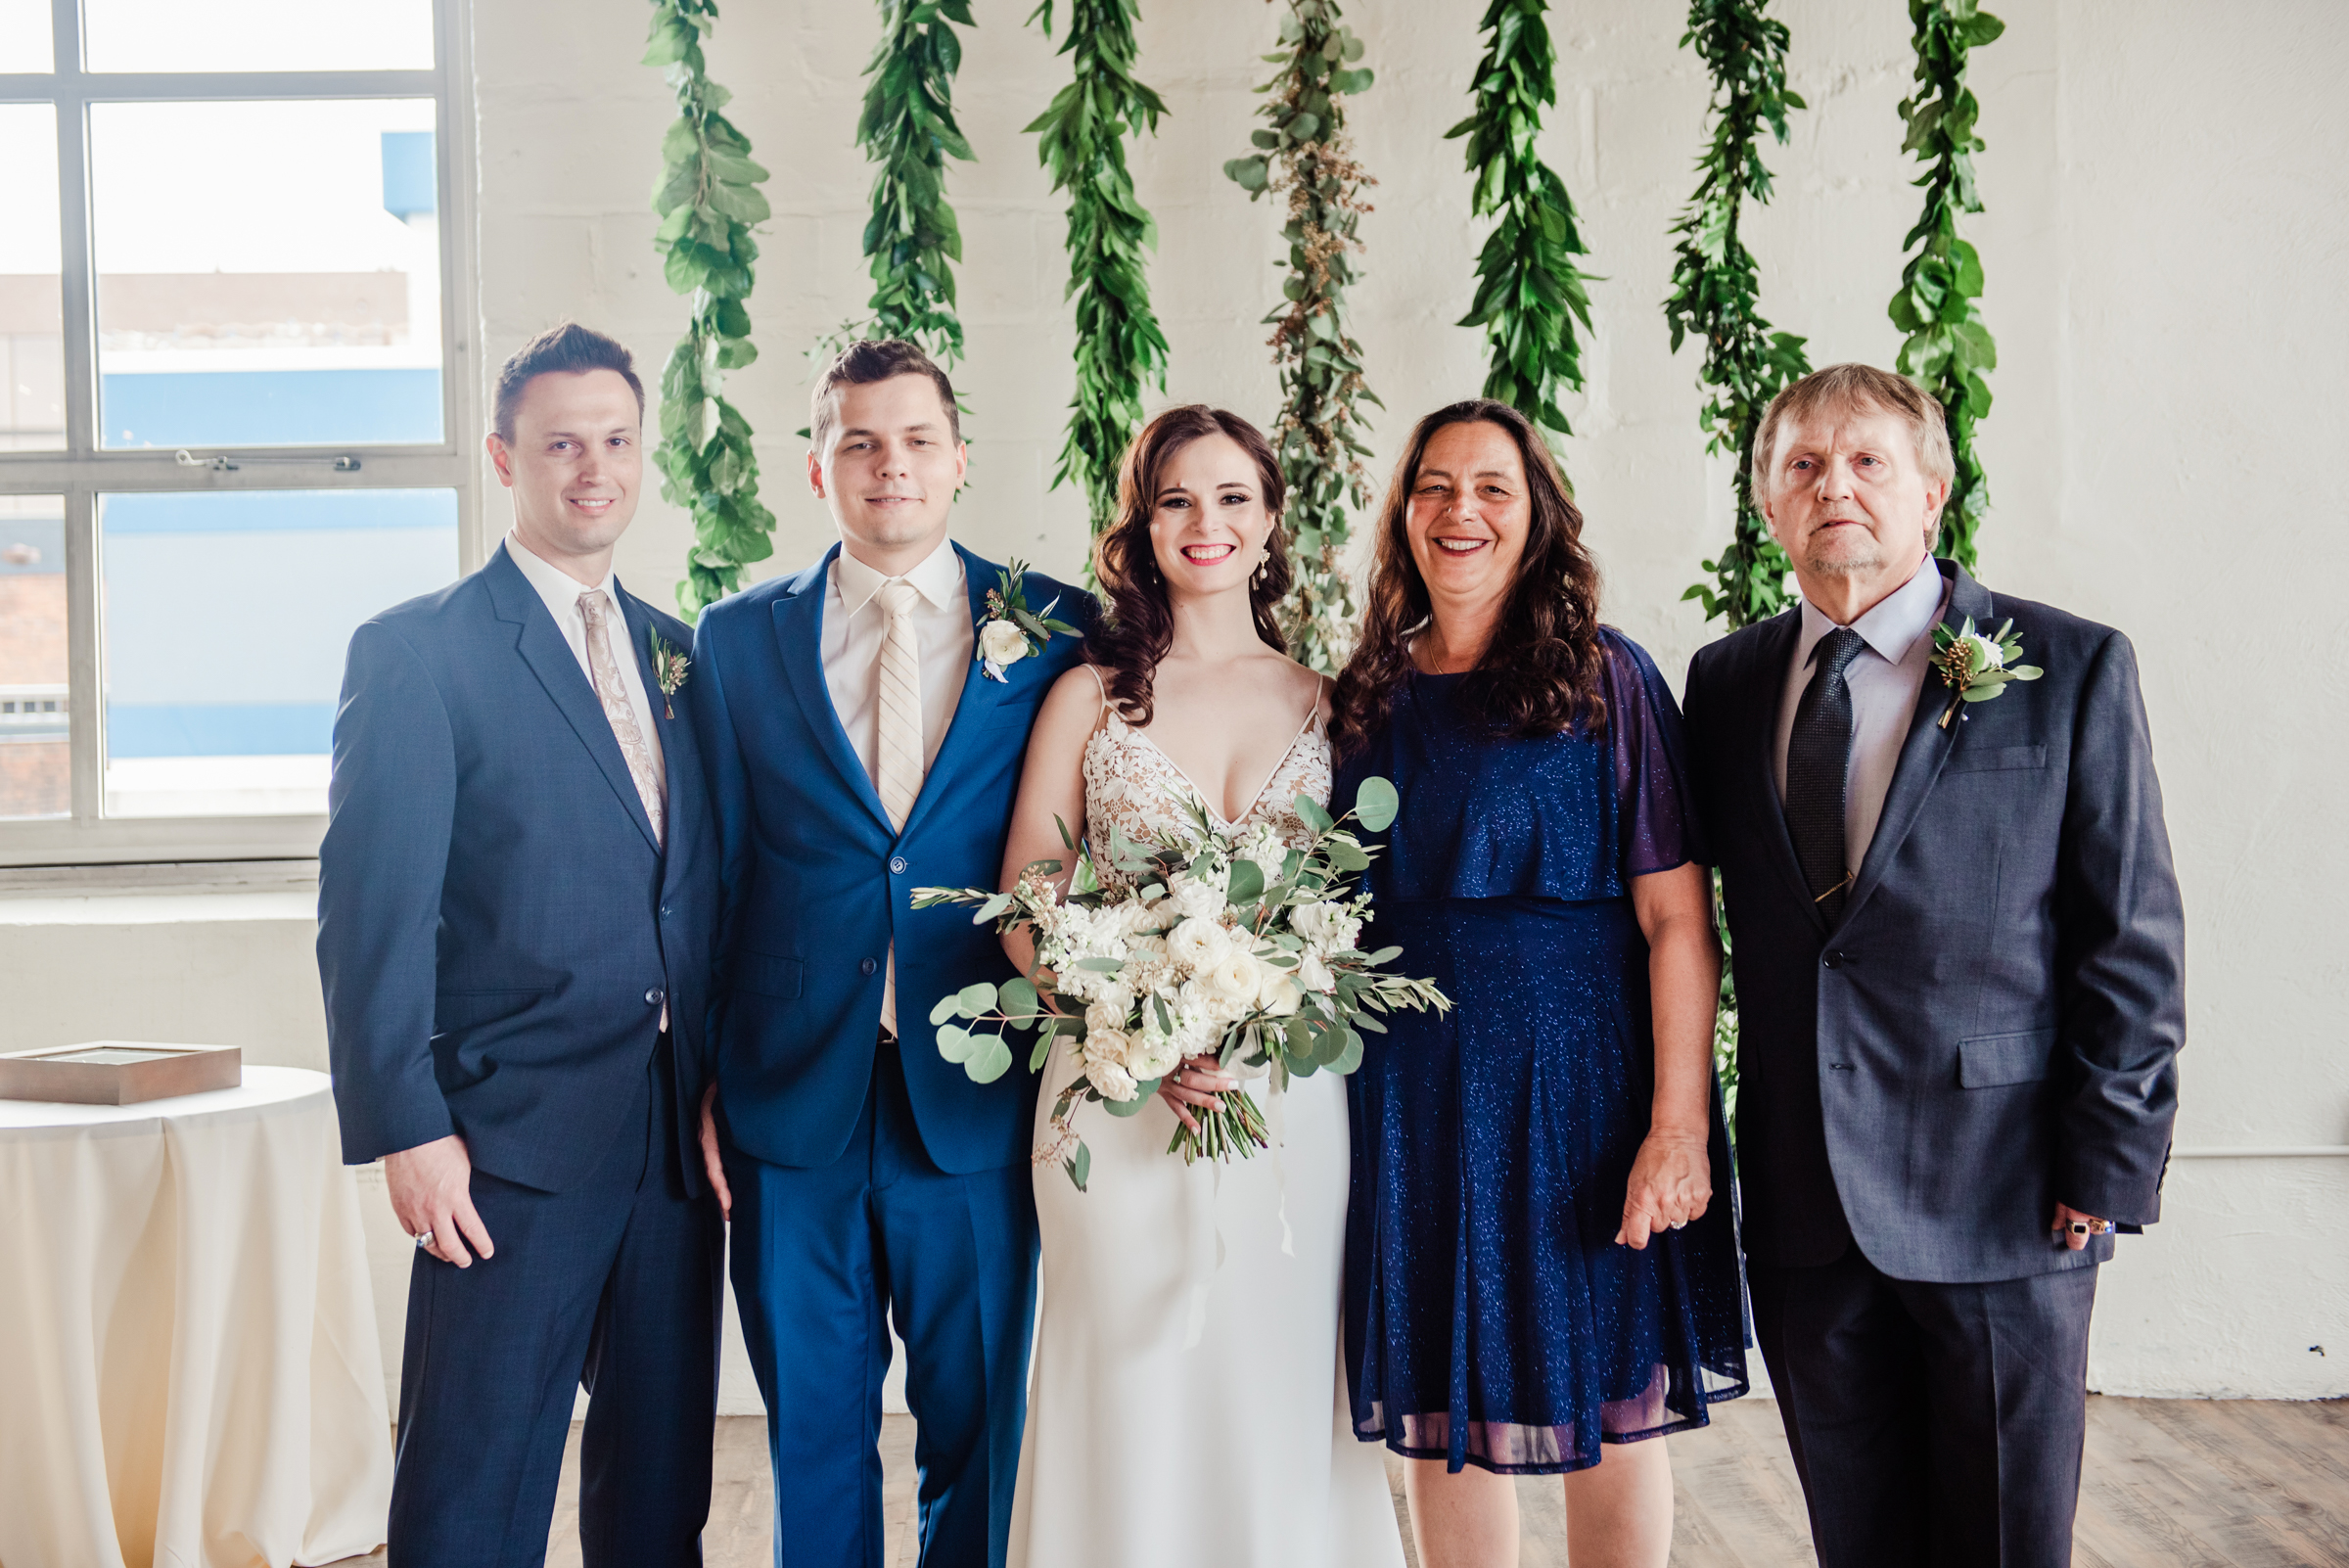 The_Arbor_LoftRochester_Wedding_JILL_STUDIO_Rochester_NY_Photographer_162833.jpg